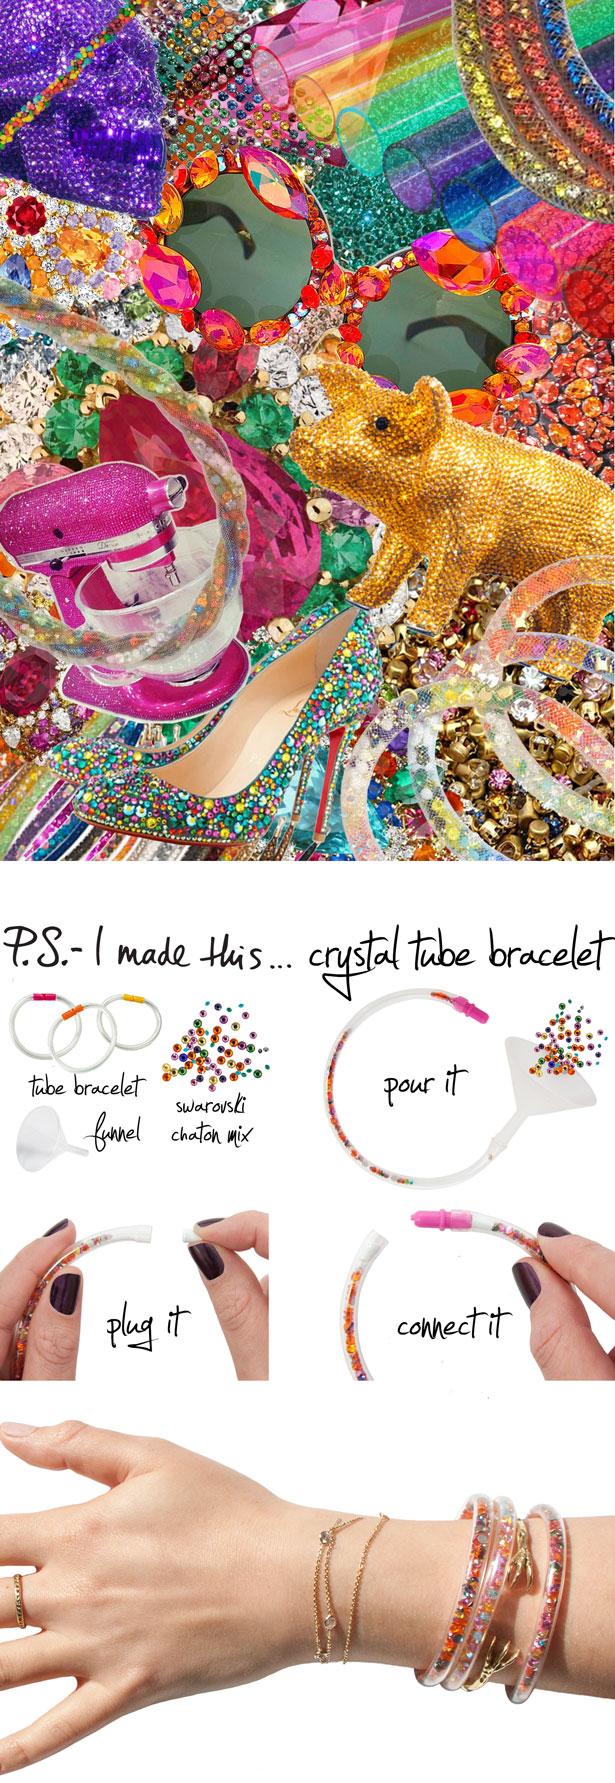 02.20.14_Crystal-Tube-Bracelet-MERGED!